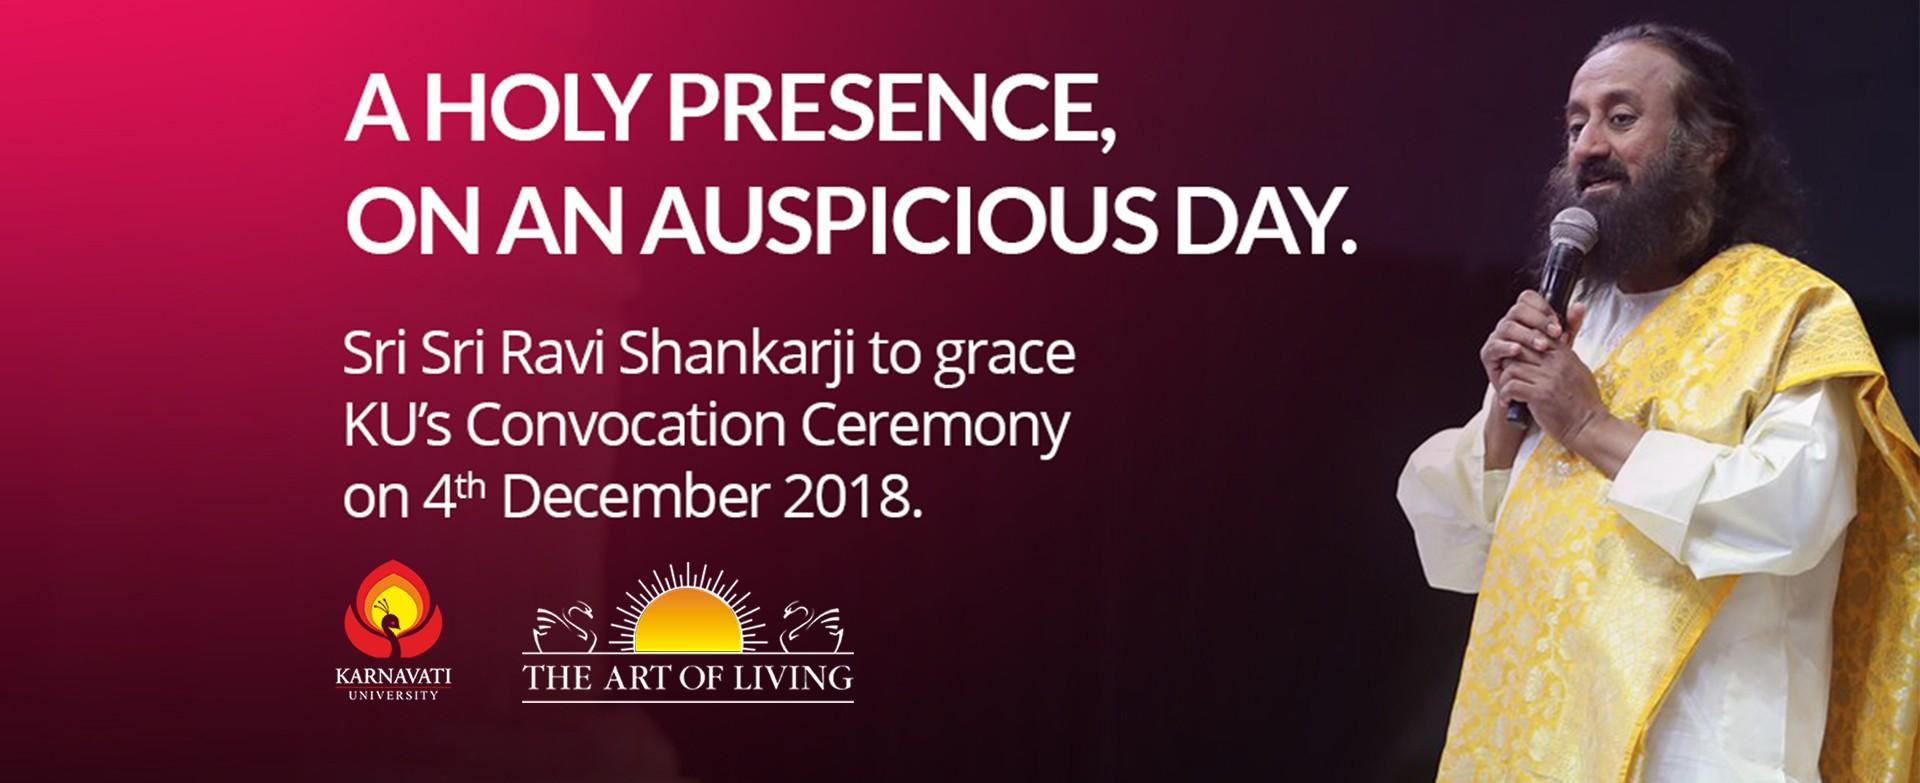 Gurudev Sri Sri Ravi Shankarji to grace Karnavati University's convocation with his presence. Image